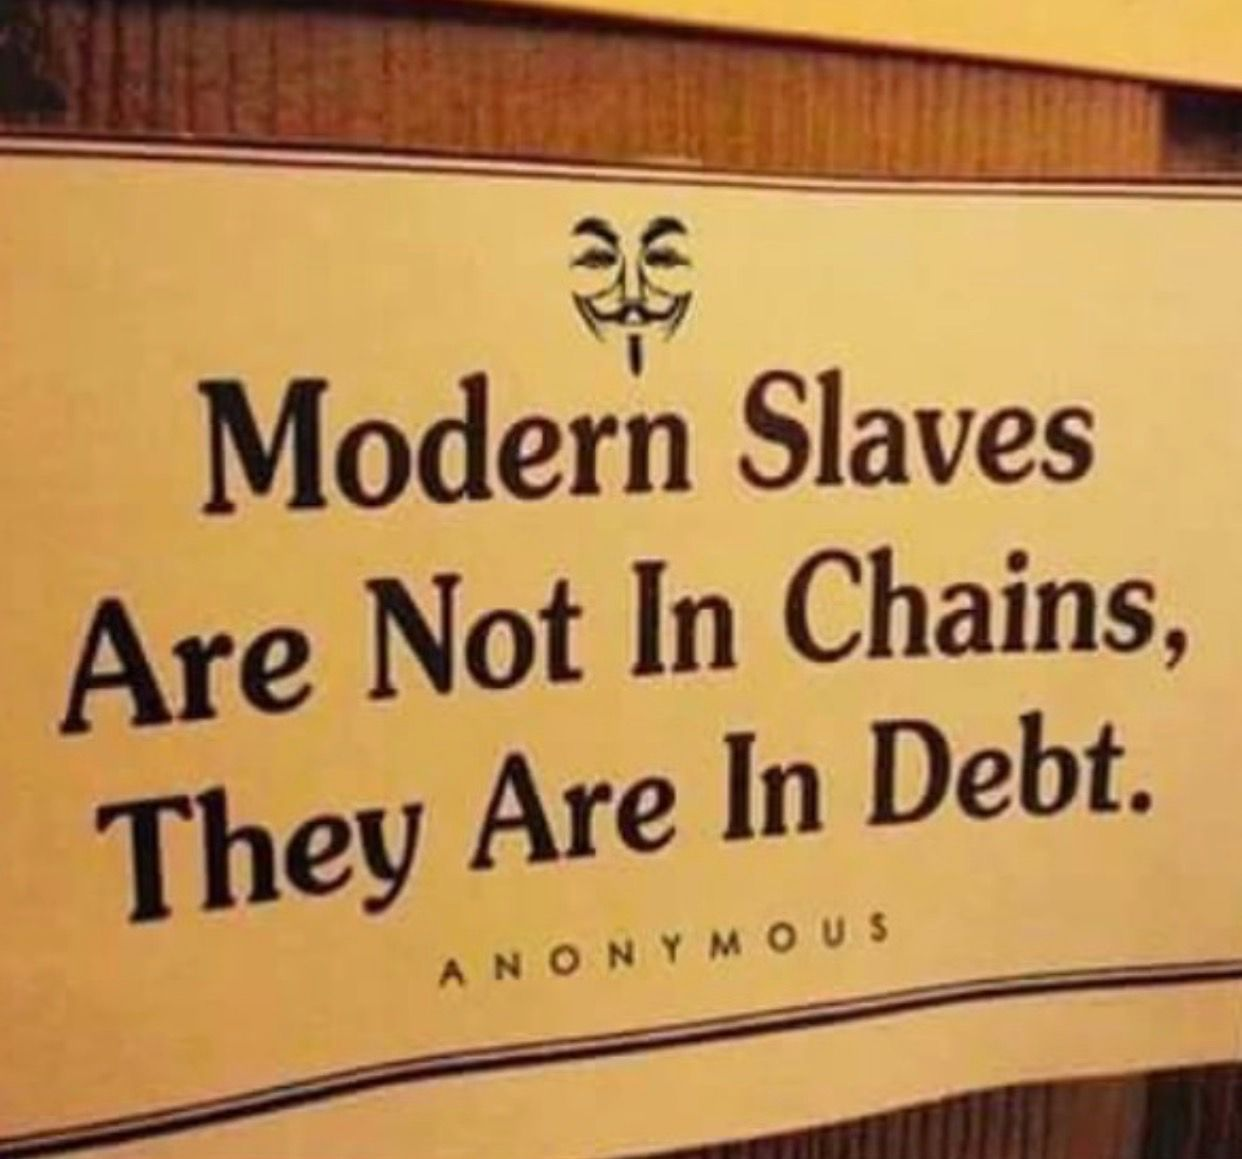 What Your Debt To Income Ratio Lookin Like Getoutofdeb